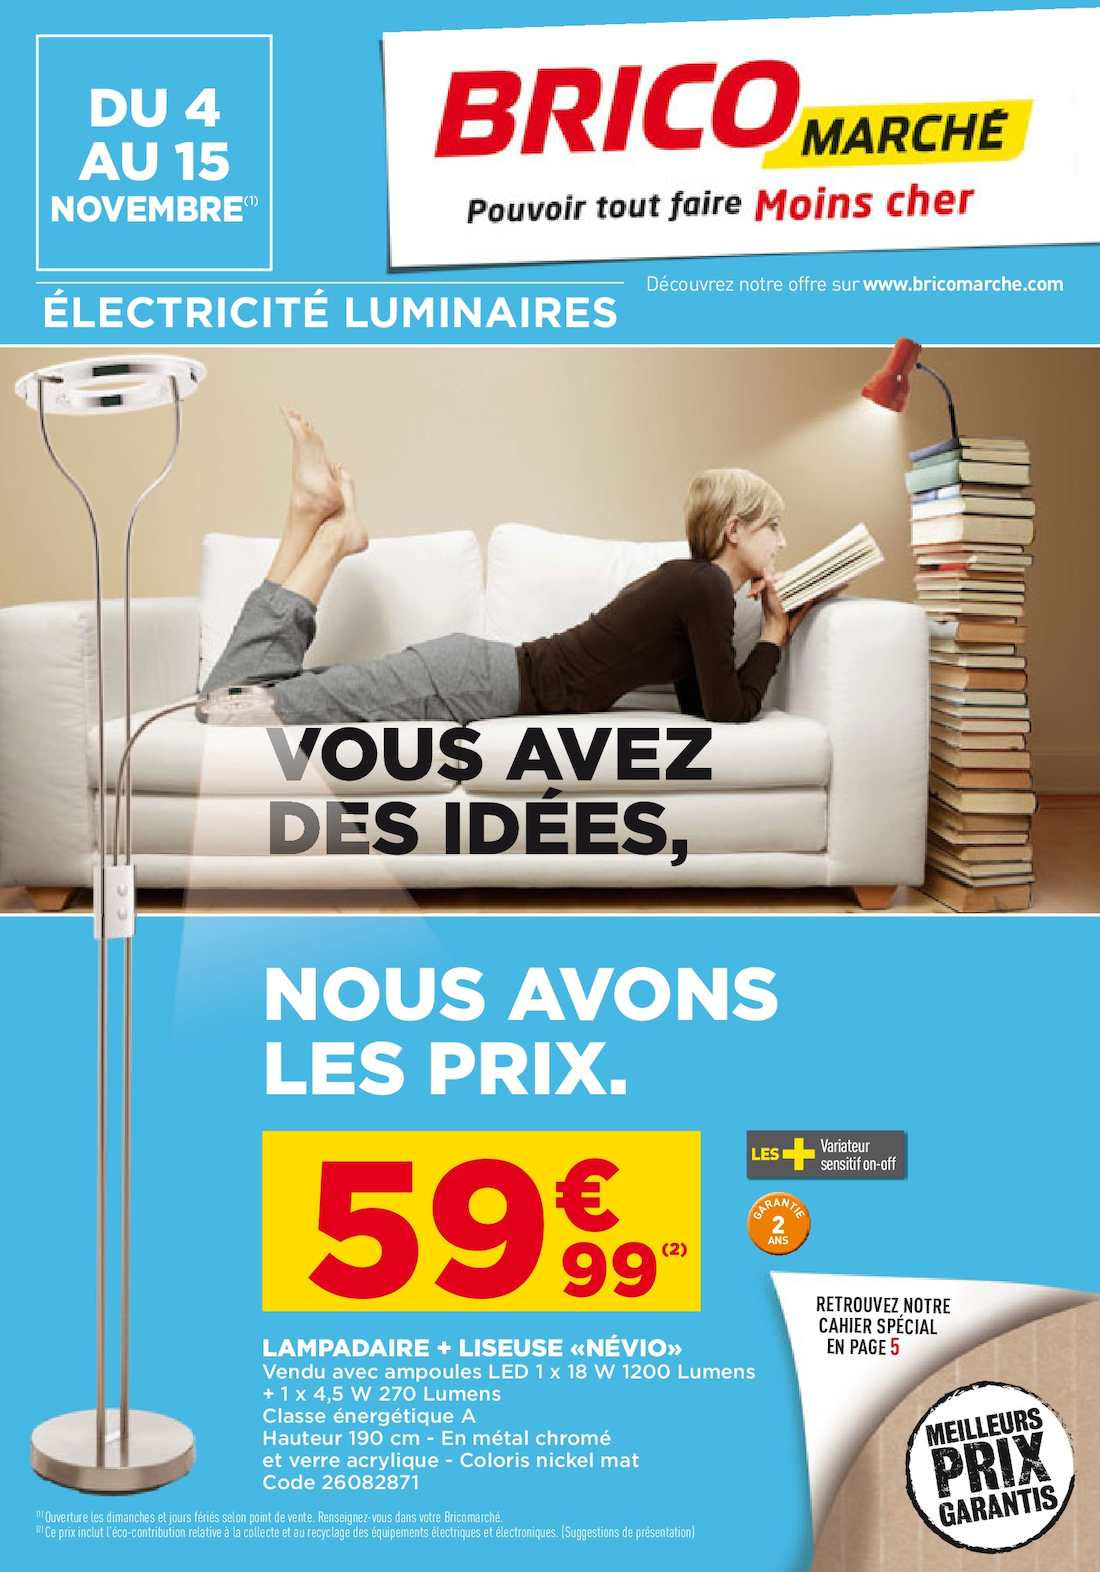 calam o electricite luminaire pensez bricomarch de. Black Bedroom Furniture Sets. Home Design Ideas